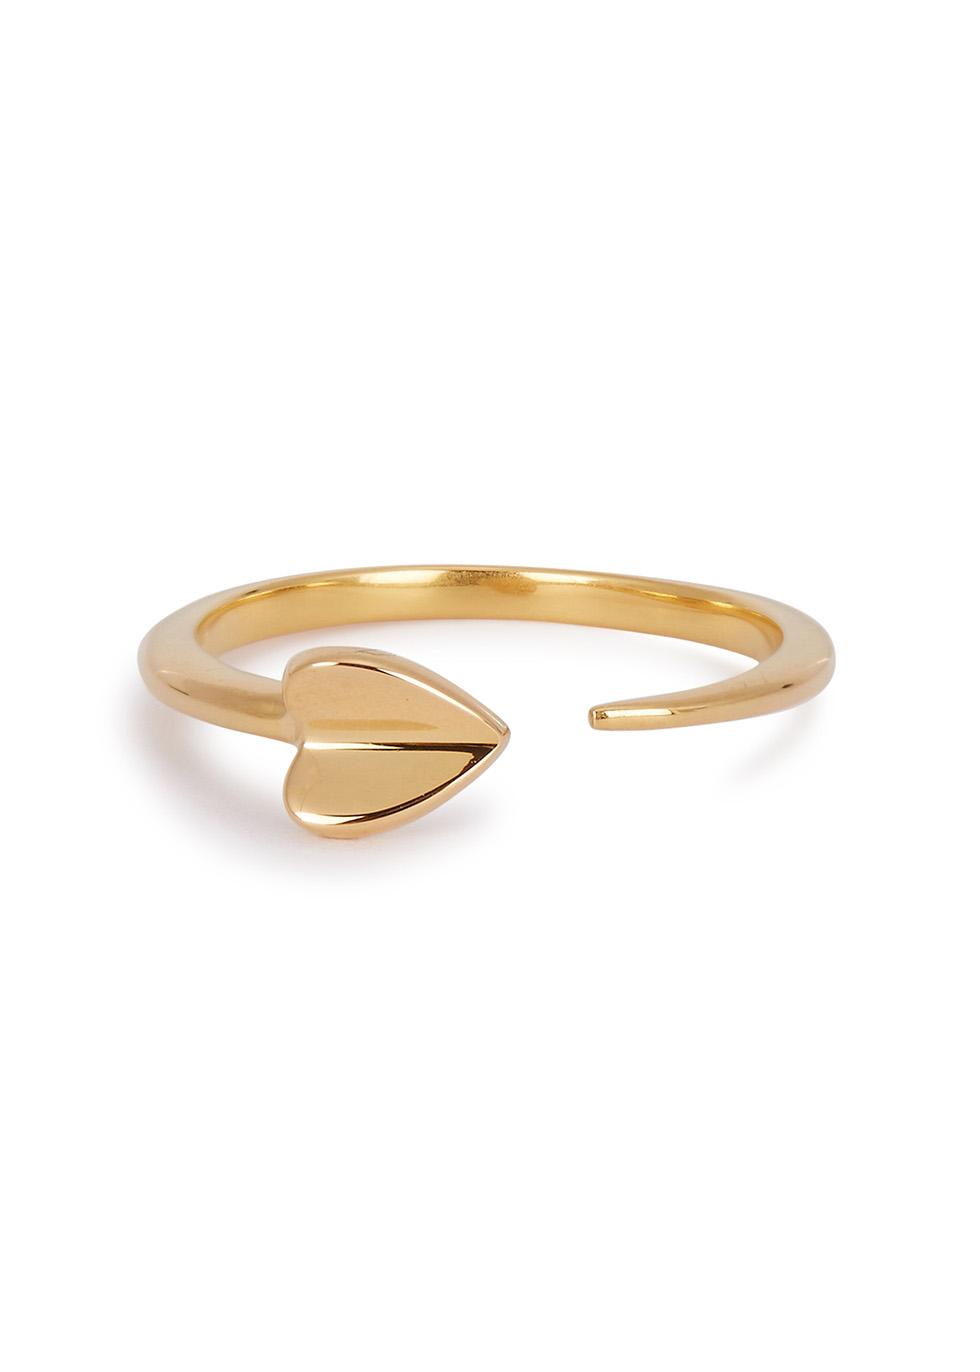 MISSOMA FOLDED HEART 18CT GOLD VERMEIL RING